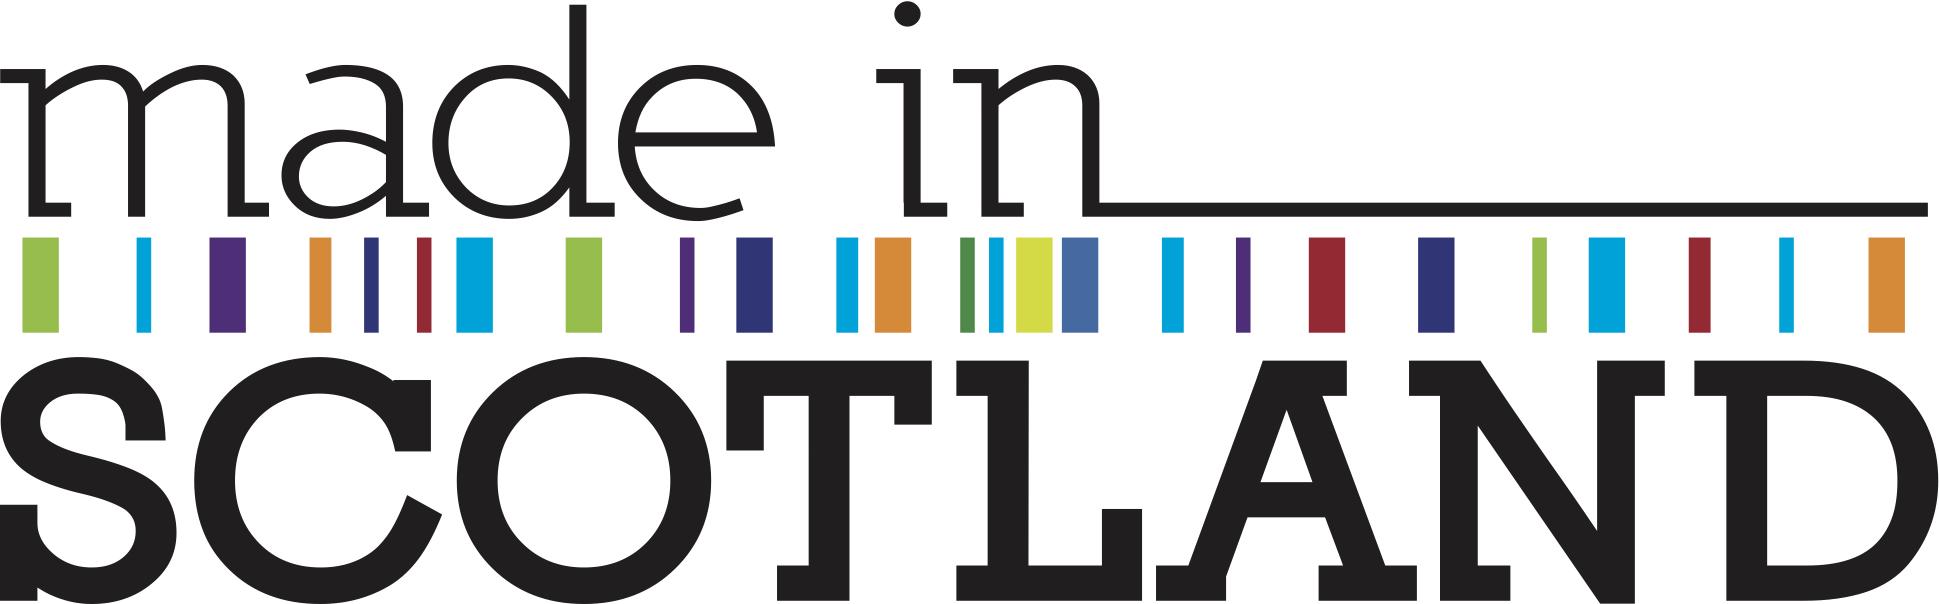 madeinscotland logo_black_text.jpg